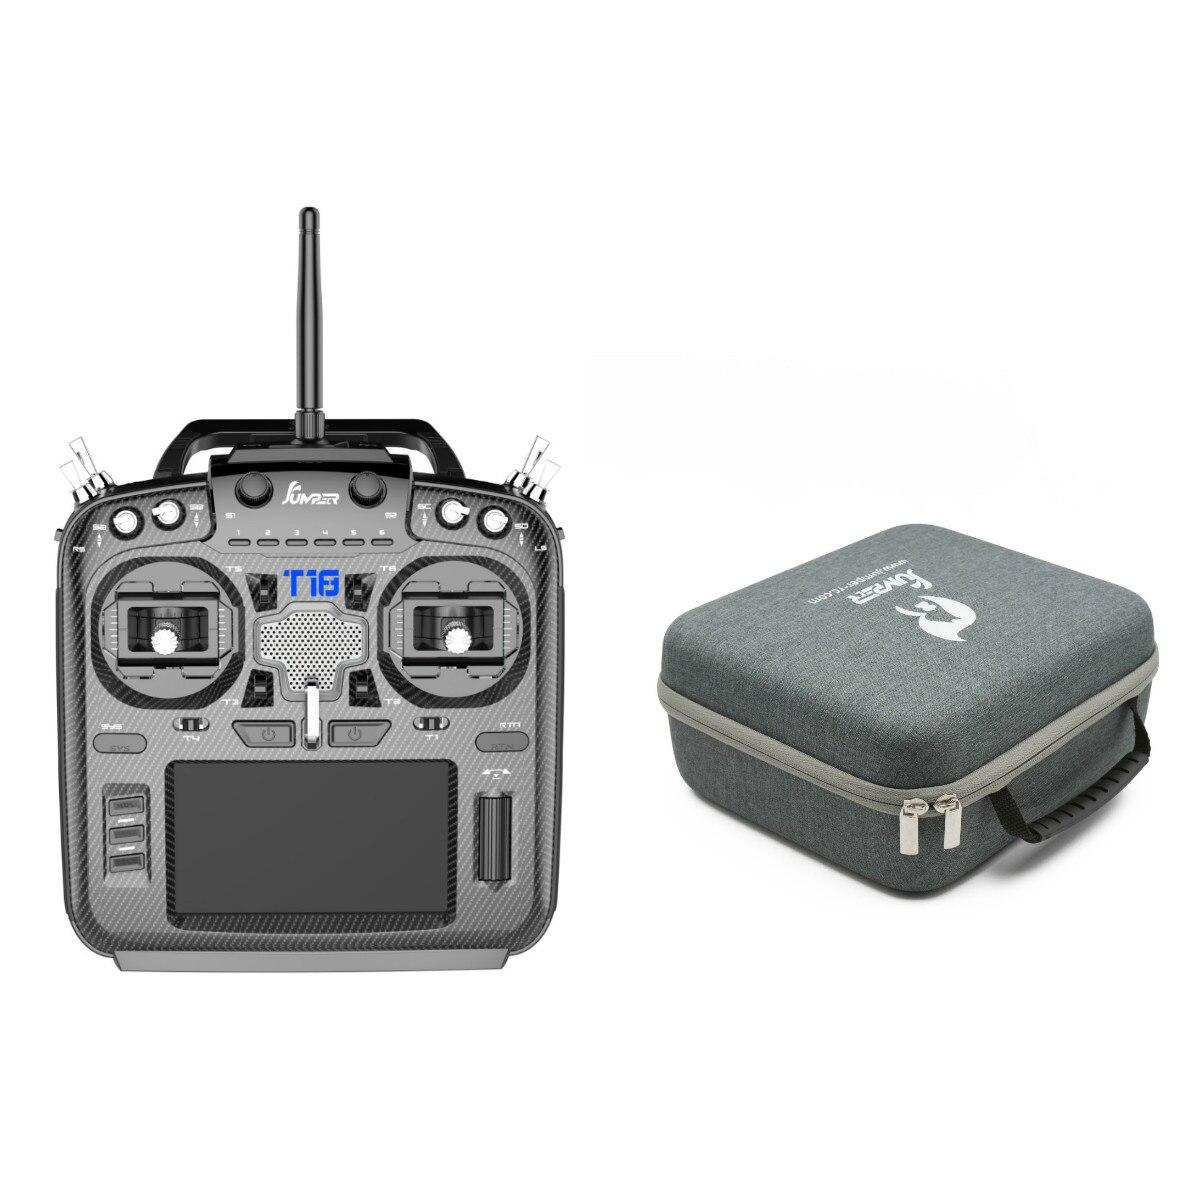 Neue Jumper T18 JP5-in-1 Multi-Protokoll RF Modul 915mhz Öffnen TX Halle Gimbal Radio Sender mit Handtasche Tragbare fall